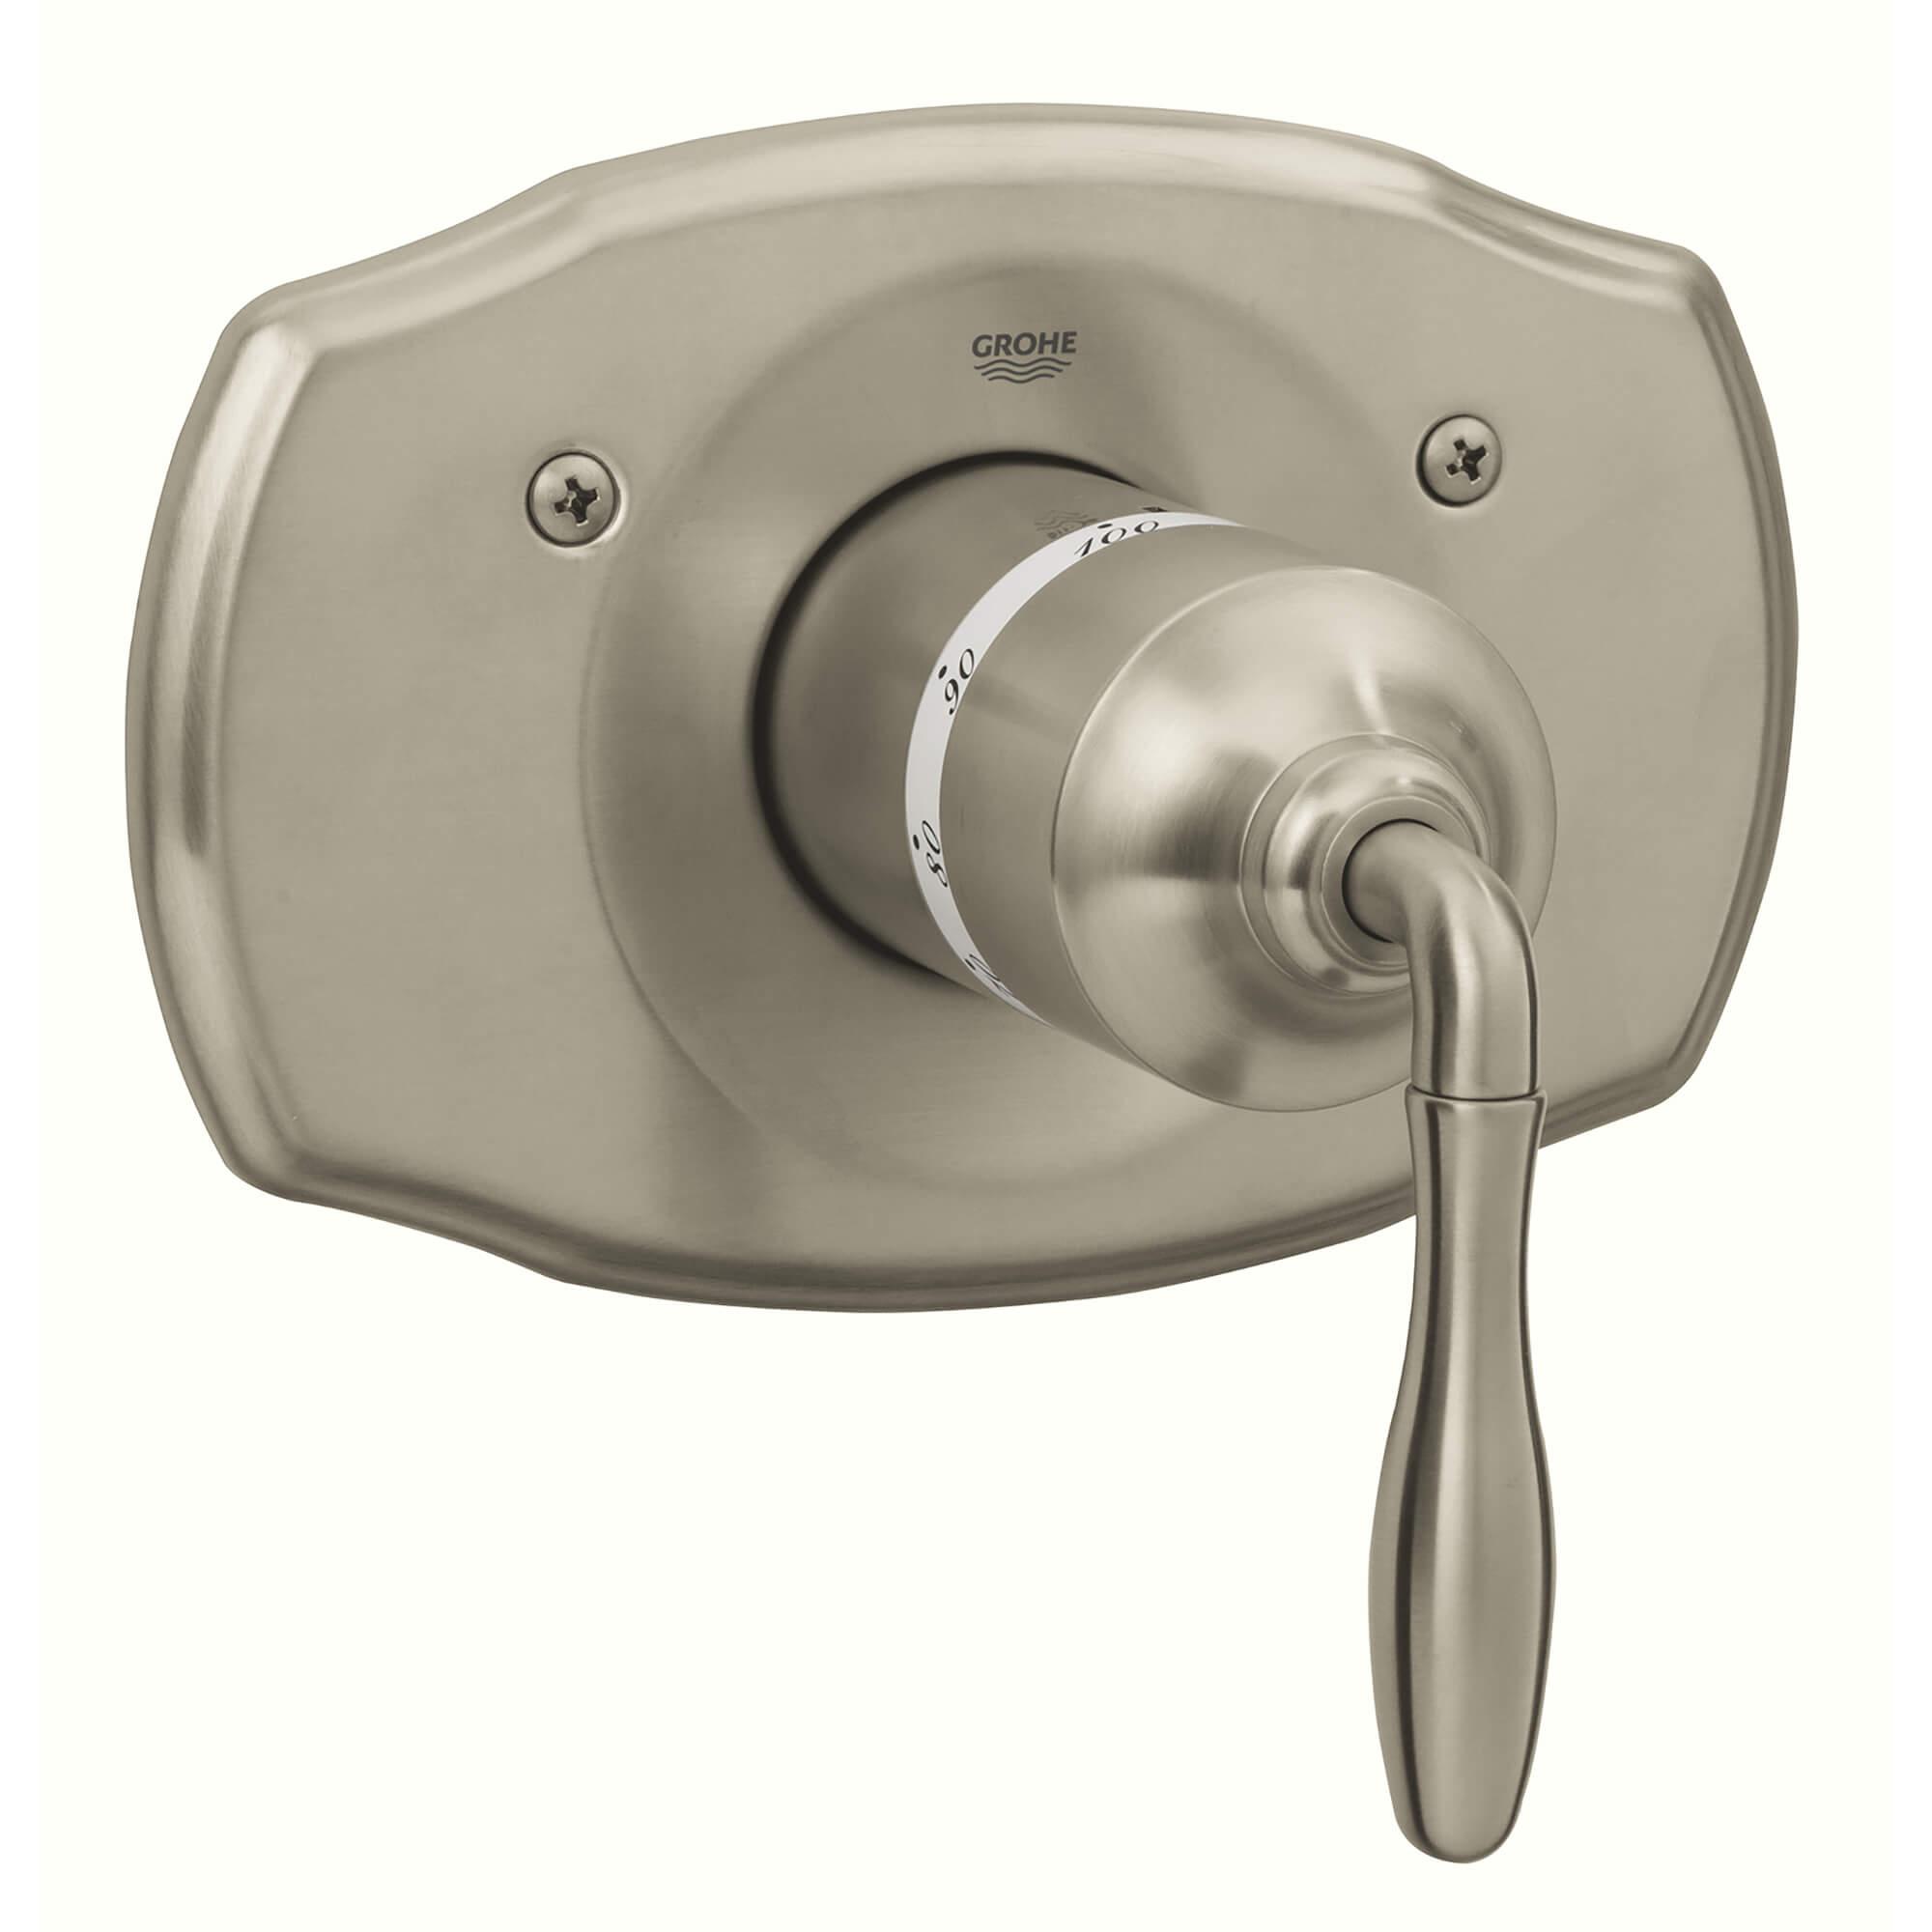 Central Thermostatic Valve Trim Grohe shower valve temperature adjustment